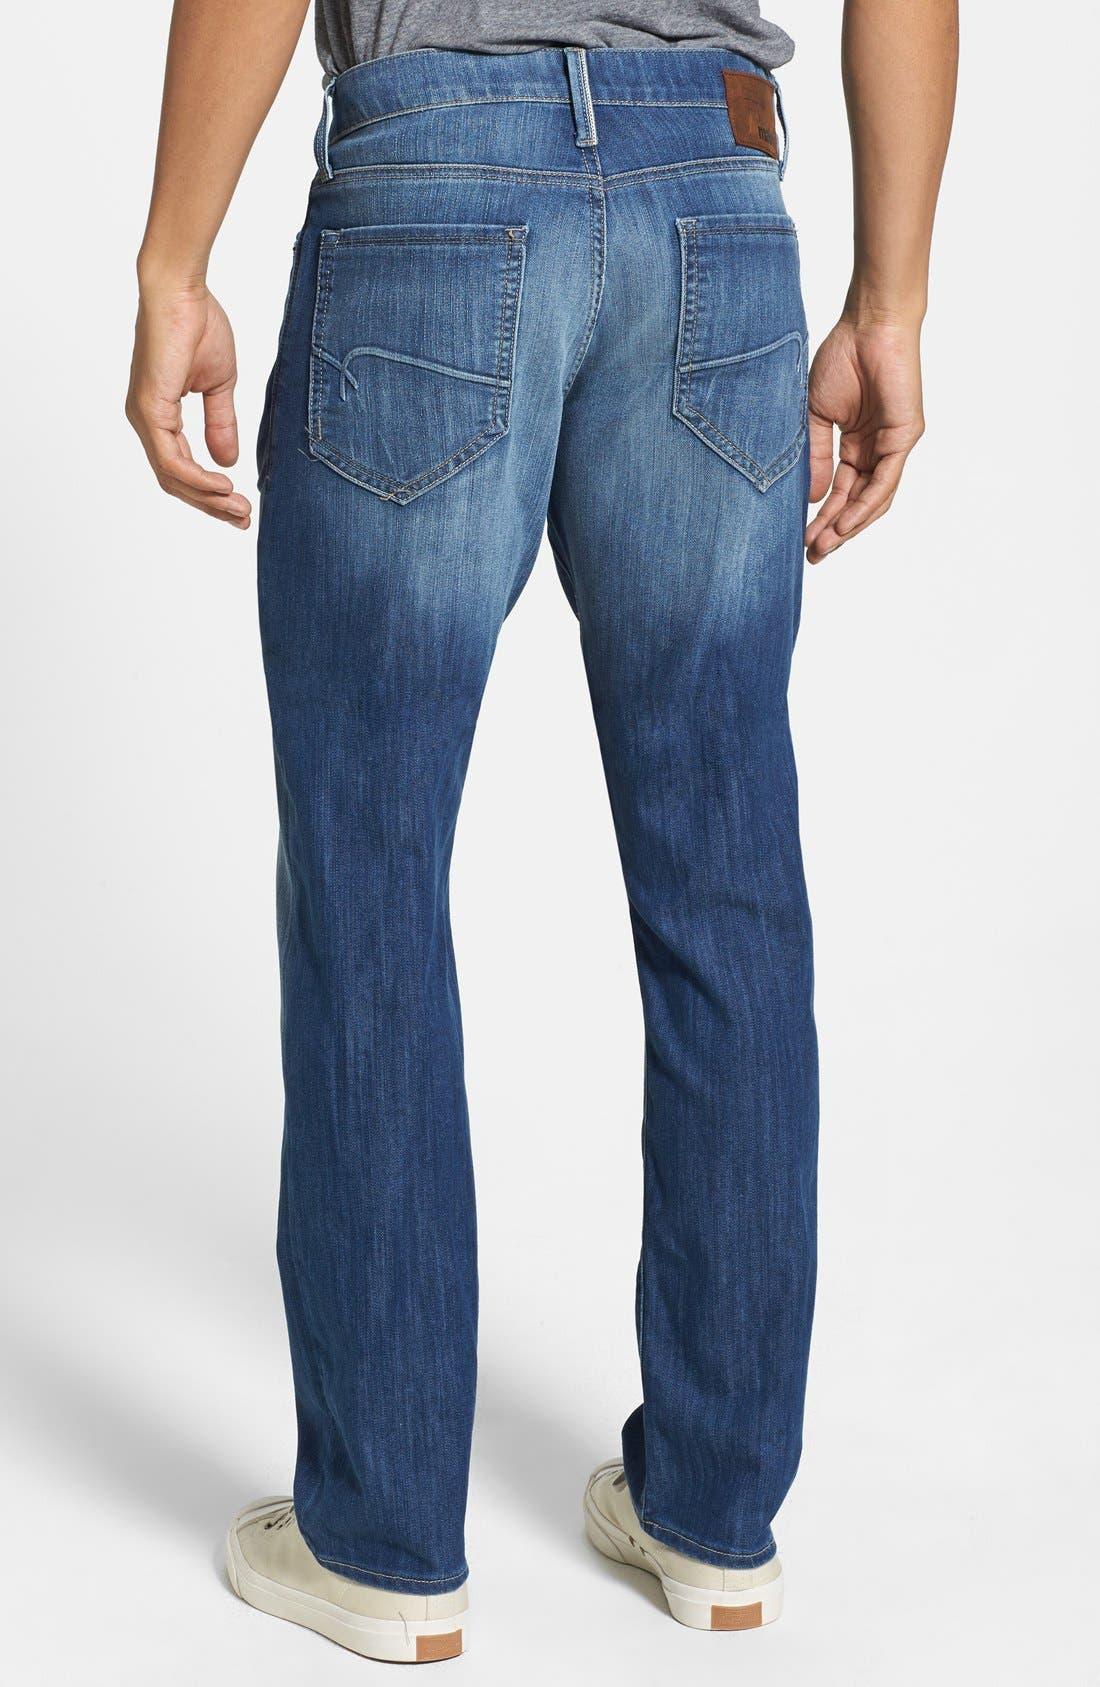 'Myles' Straight Leg Jeans,                             Alternate thumbnail 2, color,                             420